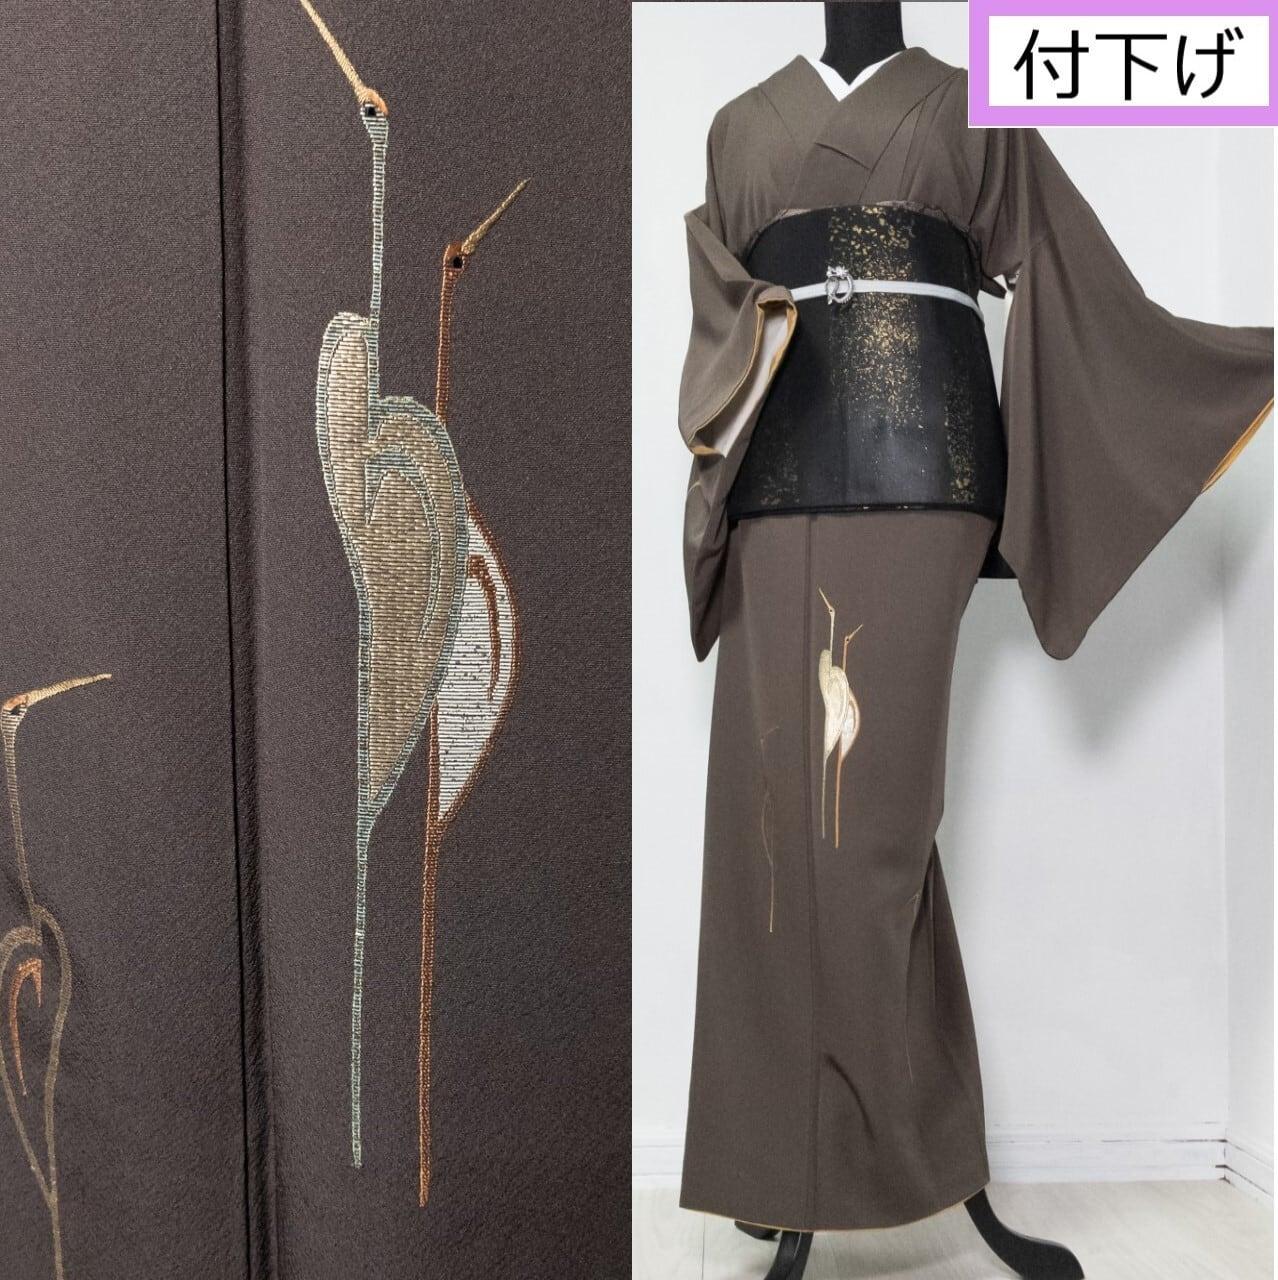 【COOL】付下げ 袷 鶴柄刺繍 マットなミルクココア色 丈160裄67